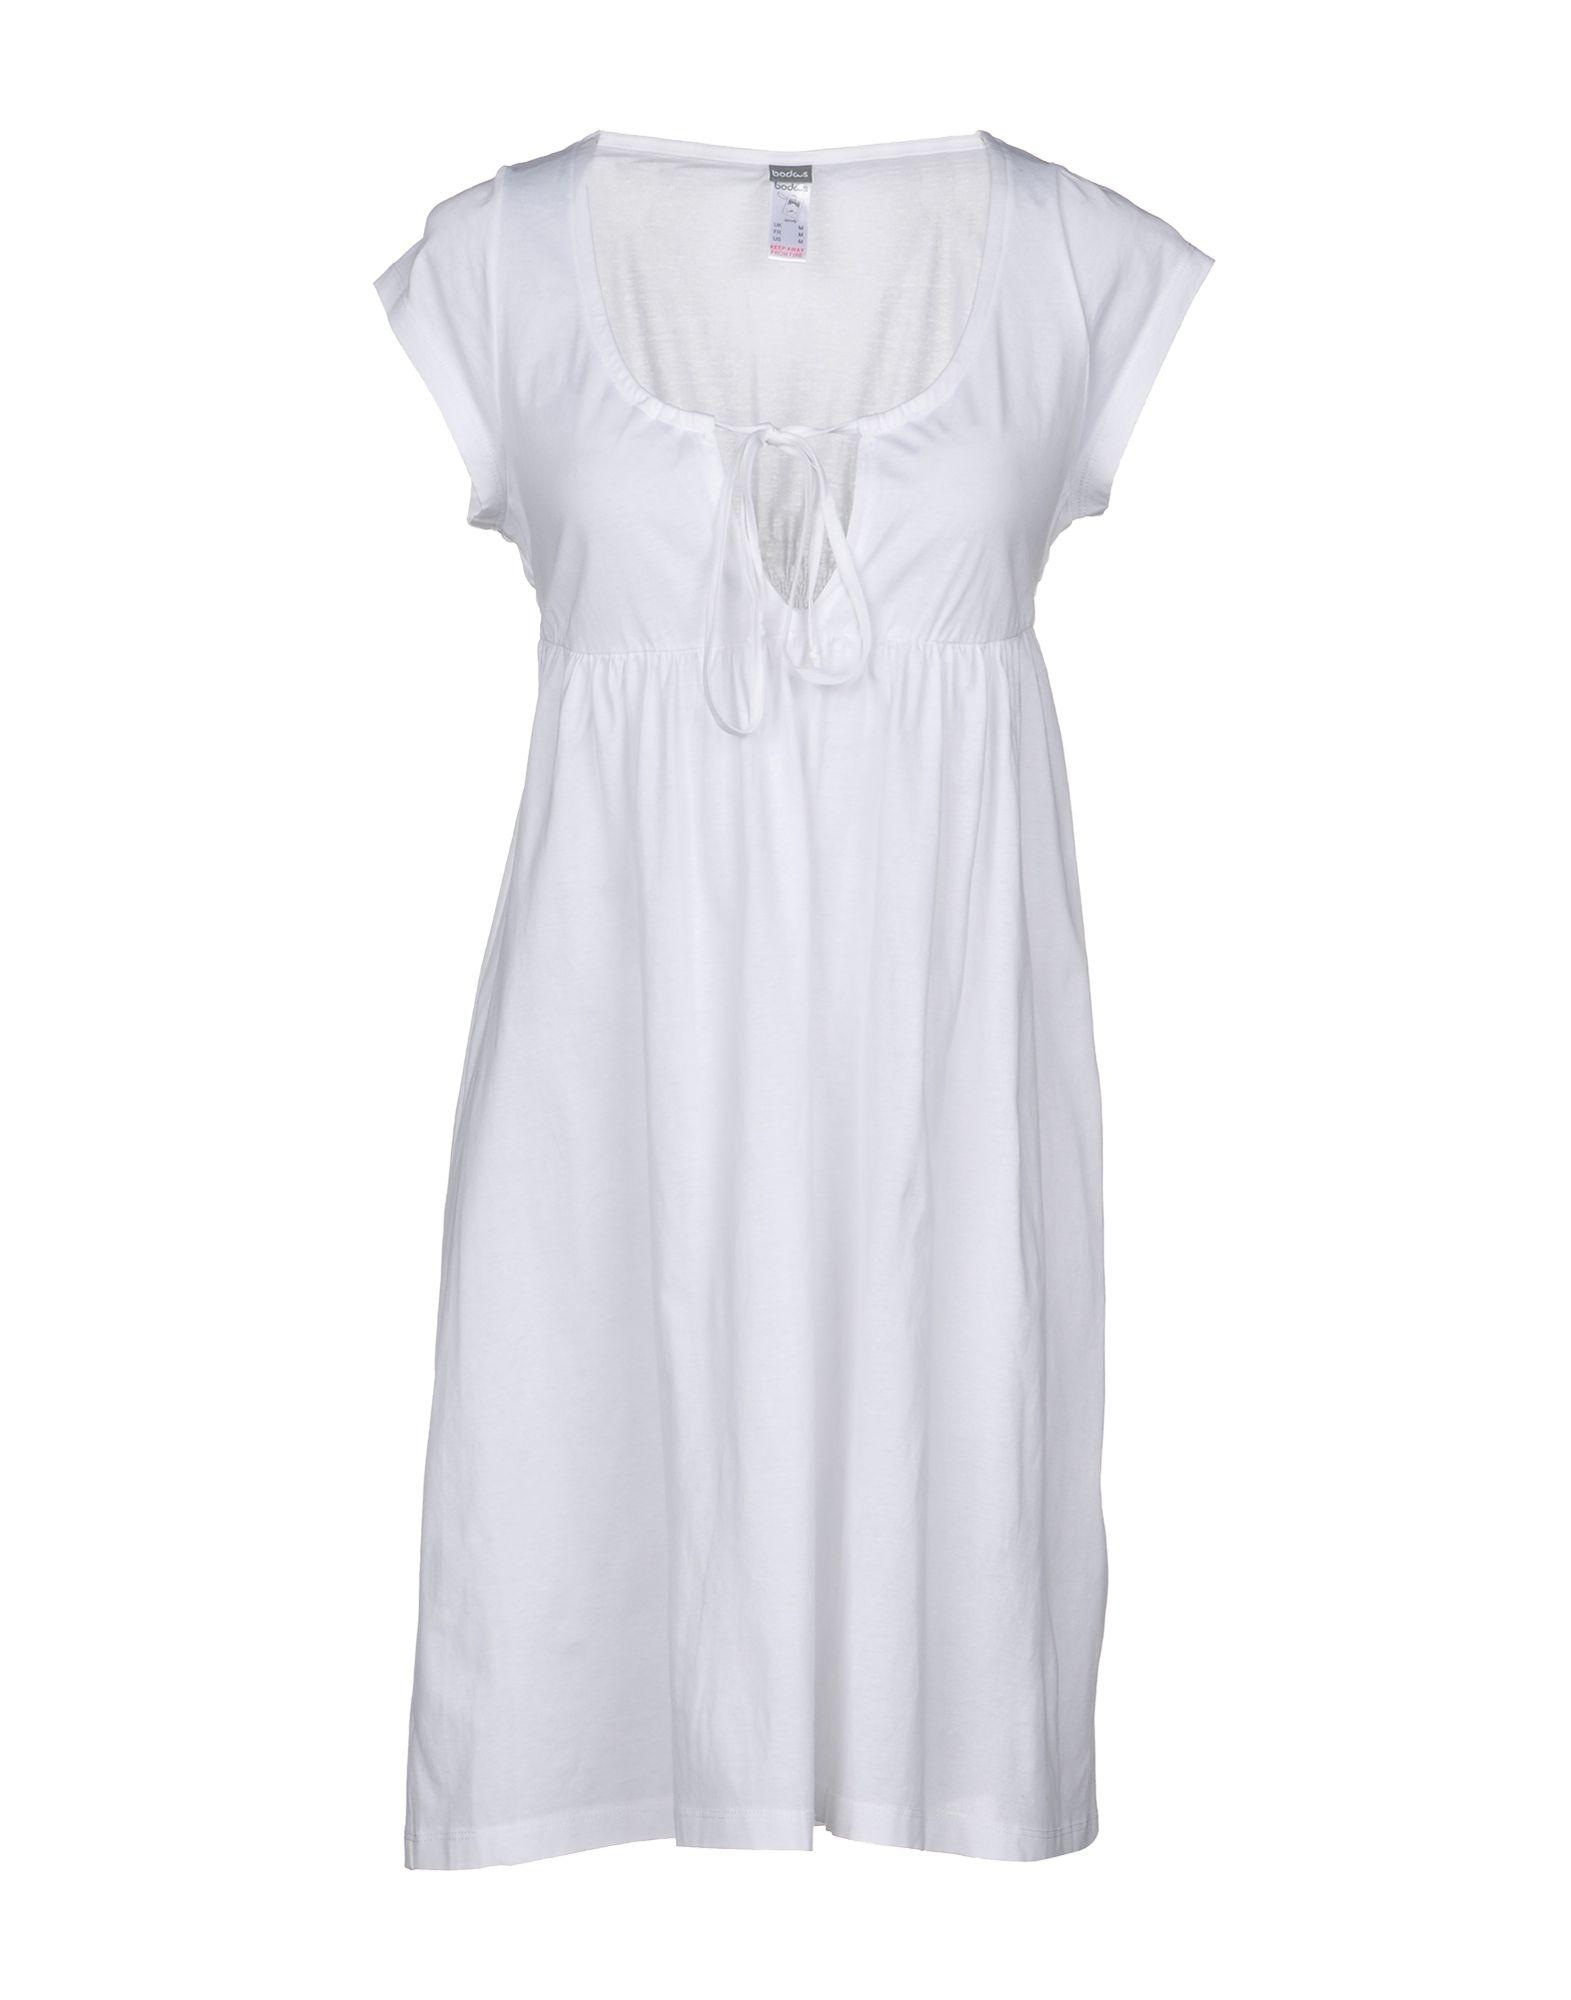 Bodas - White Nightdress - Lyst. View fullscreen 42edc5362